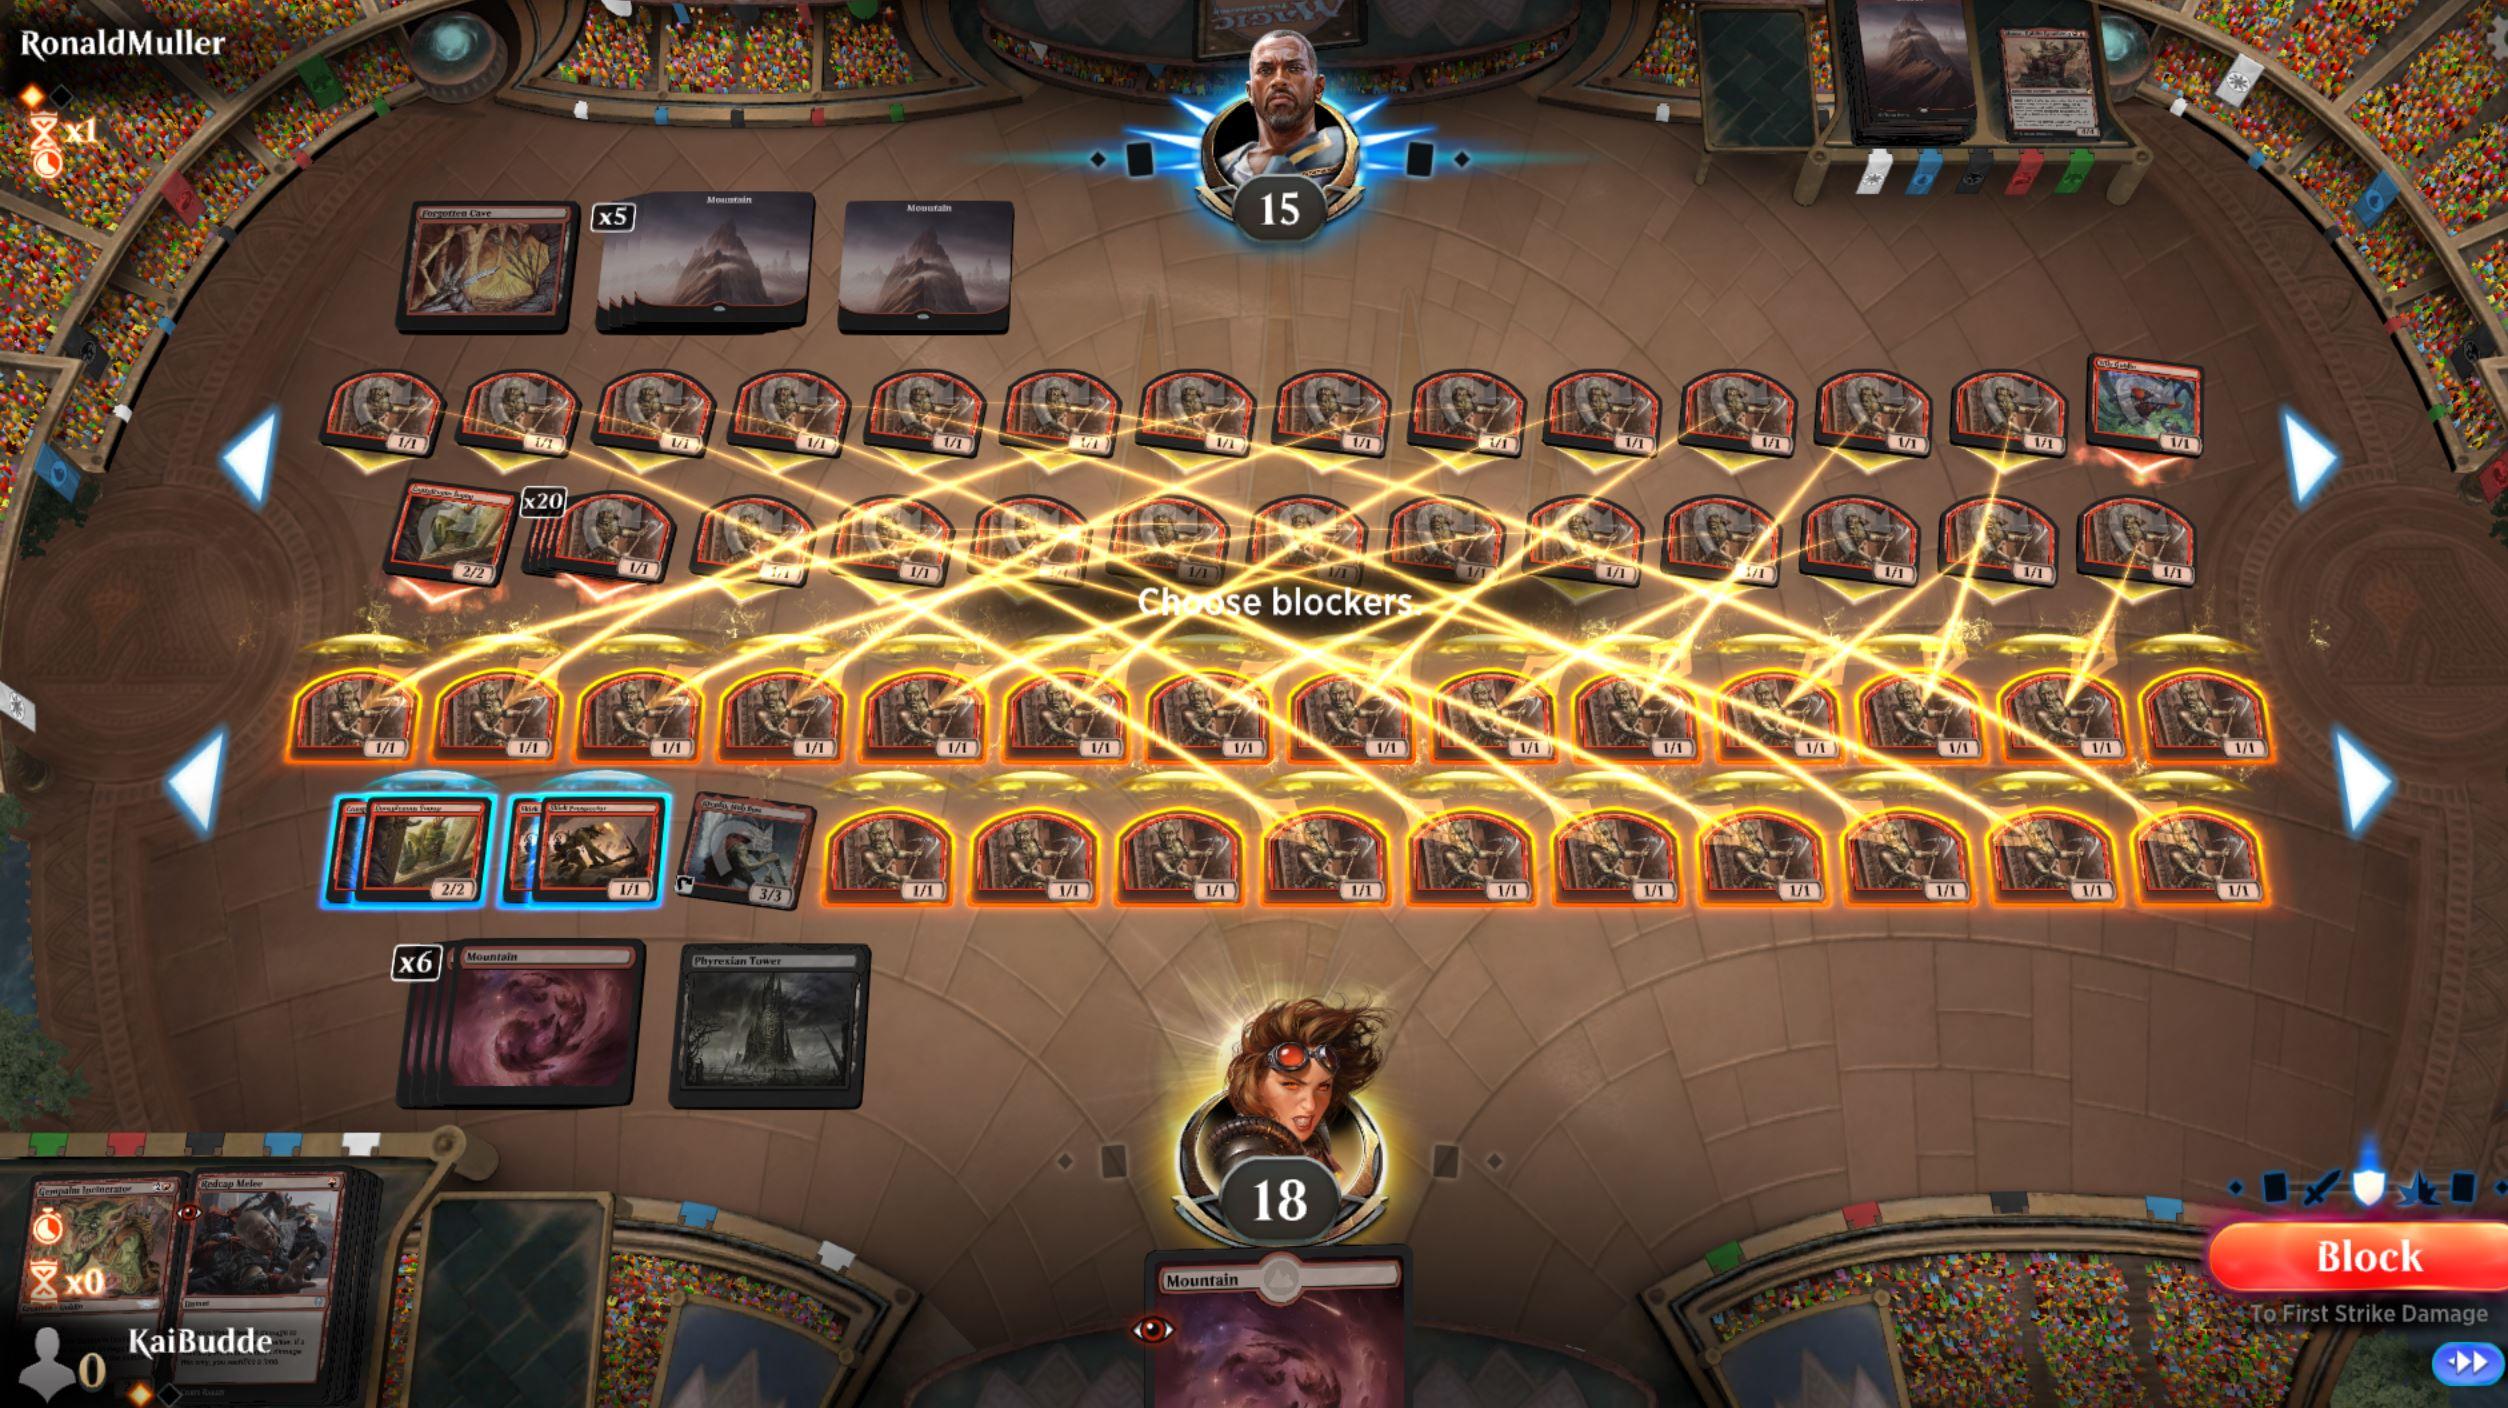 Magic: The Gathering + Magic Arena | INFO.: 1ER POST DE LA PÁG. 1 - Página 5 EhkWZSaX0AEbieM?format=jpg&name=4096x4096